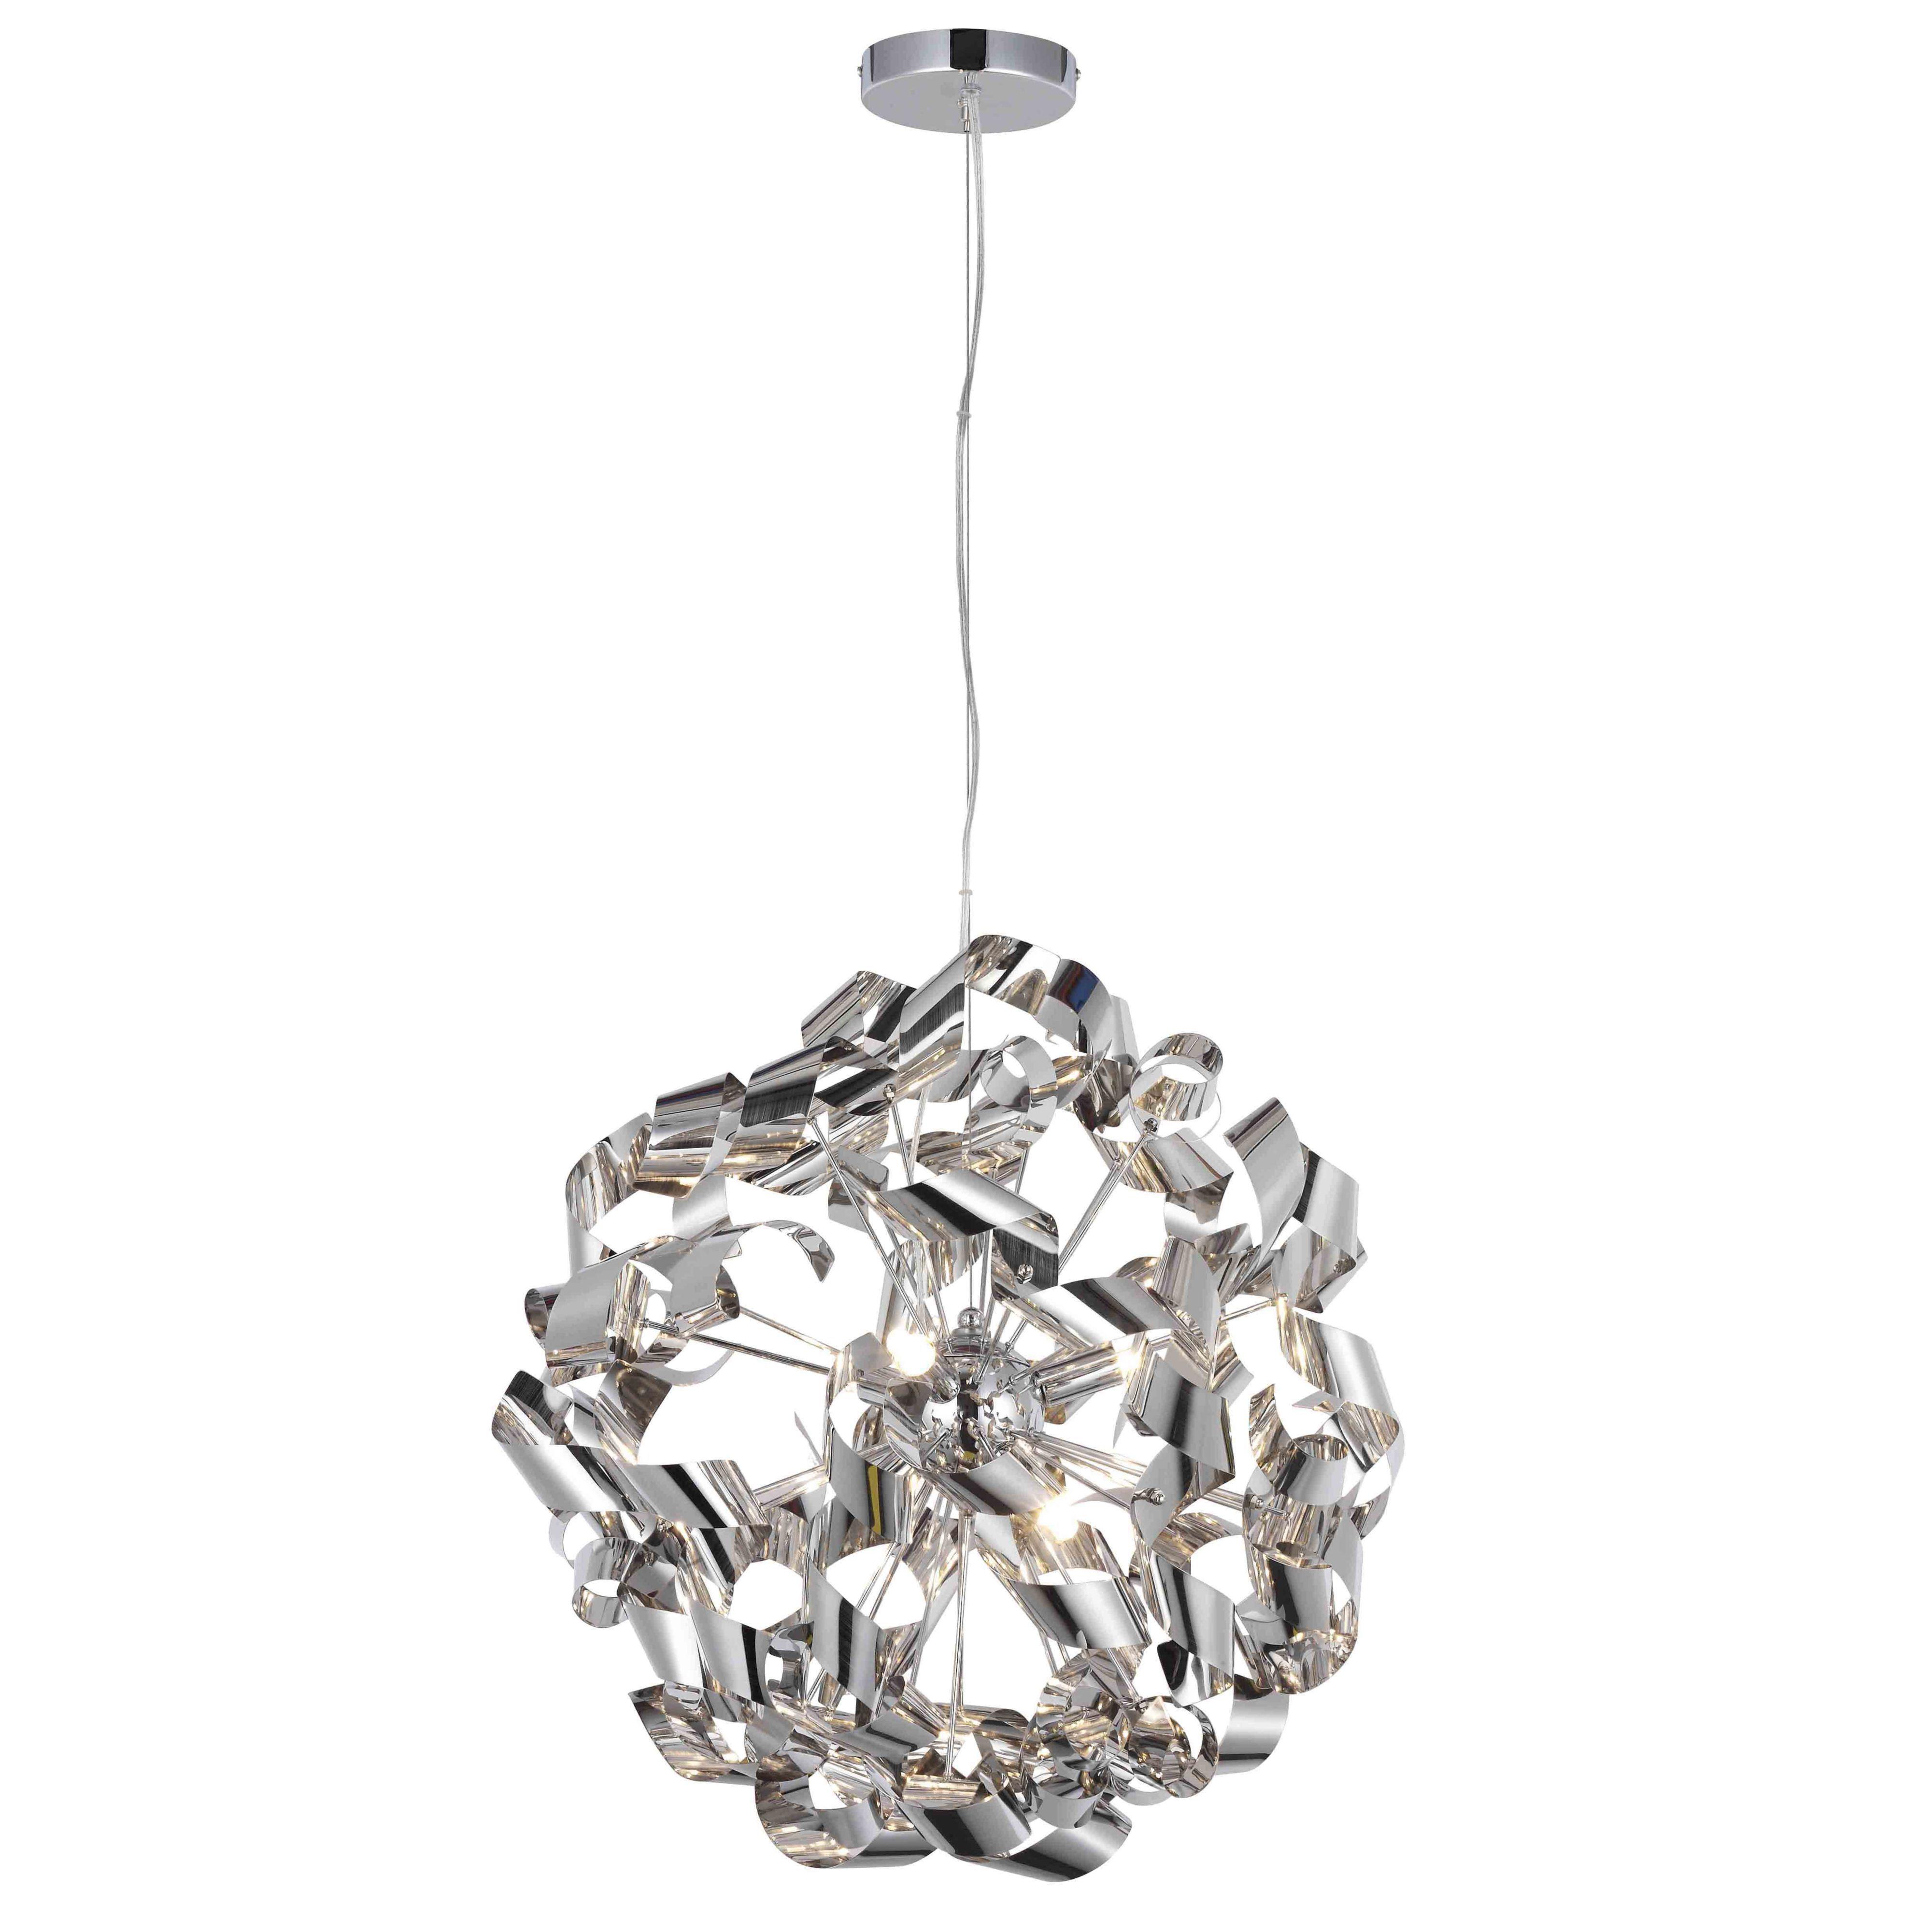 Diy at bq marcela modern brushed 6 lamp ceiling light arubaitofo Images